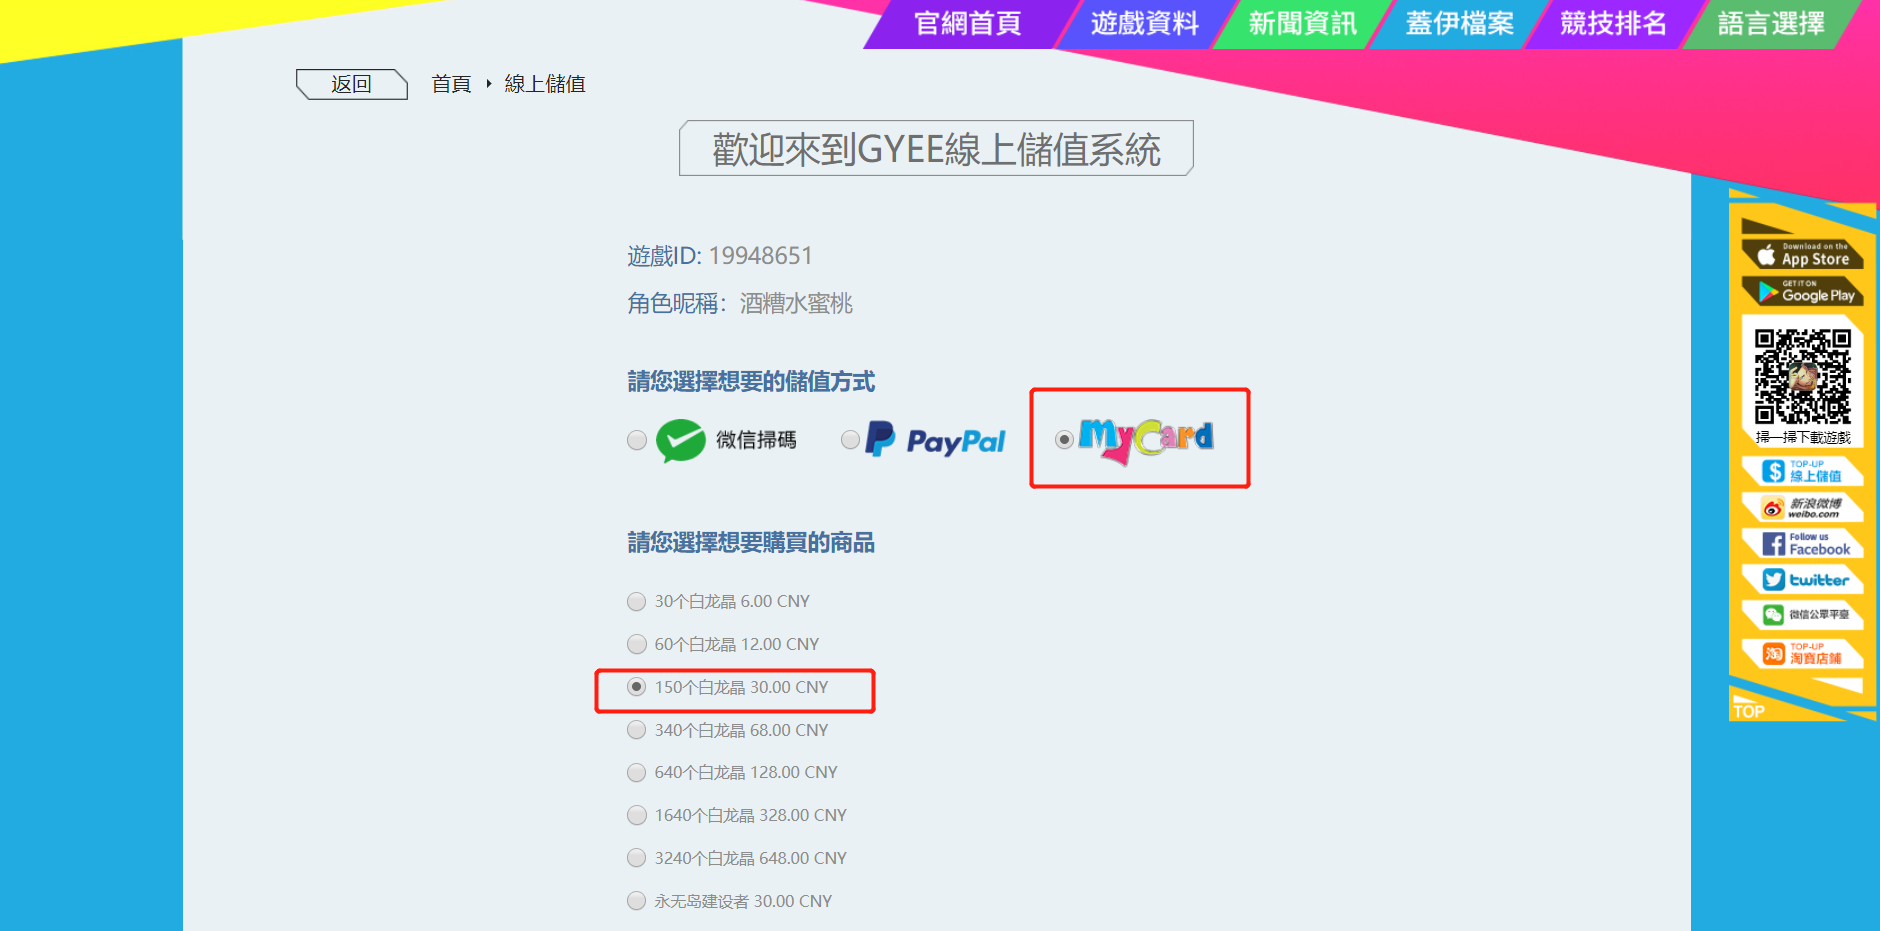 Mycard储值活动详细流程指南-使用mycard付费1.png